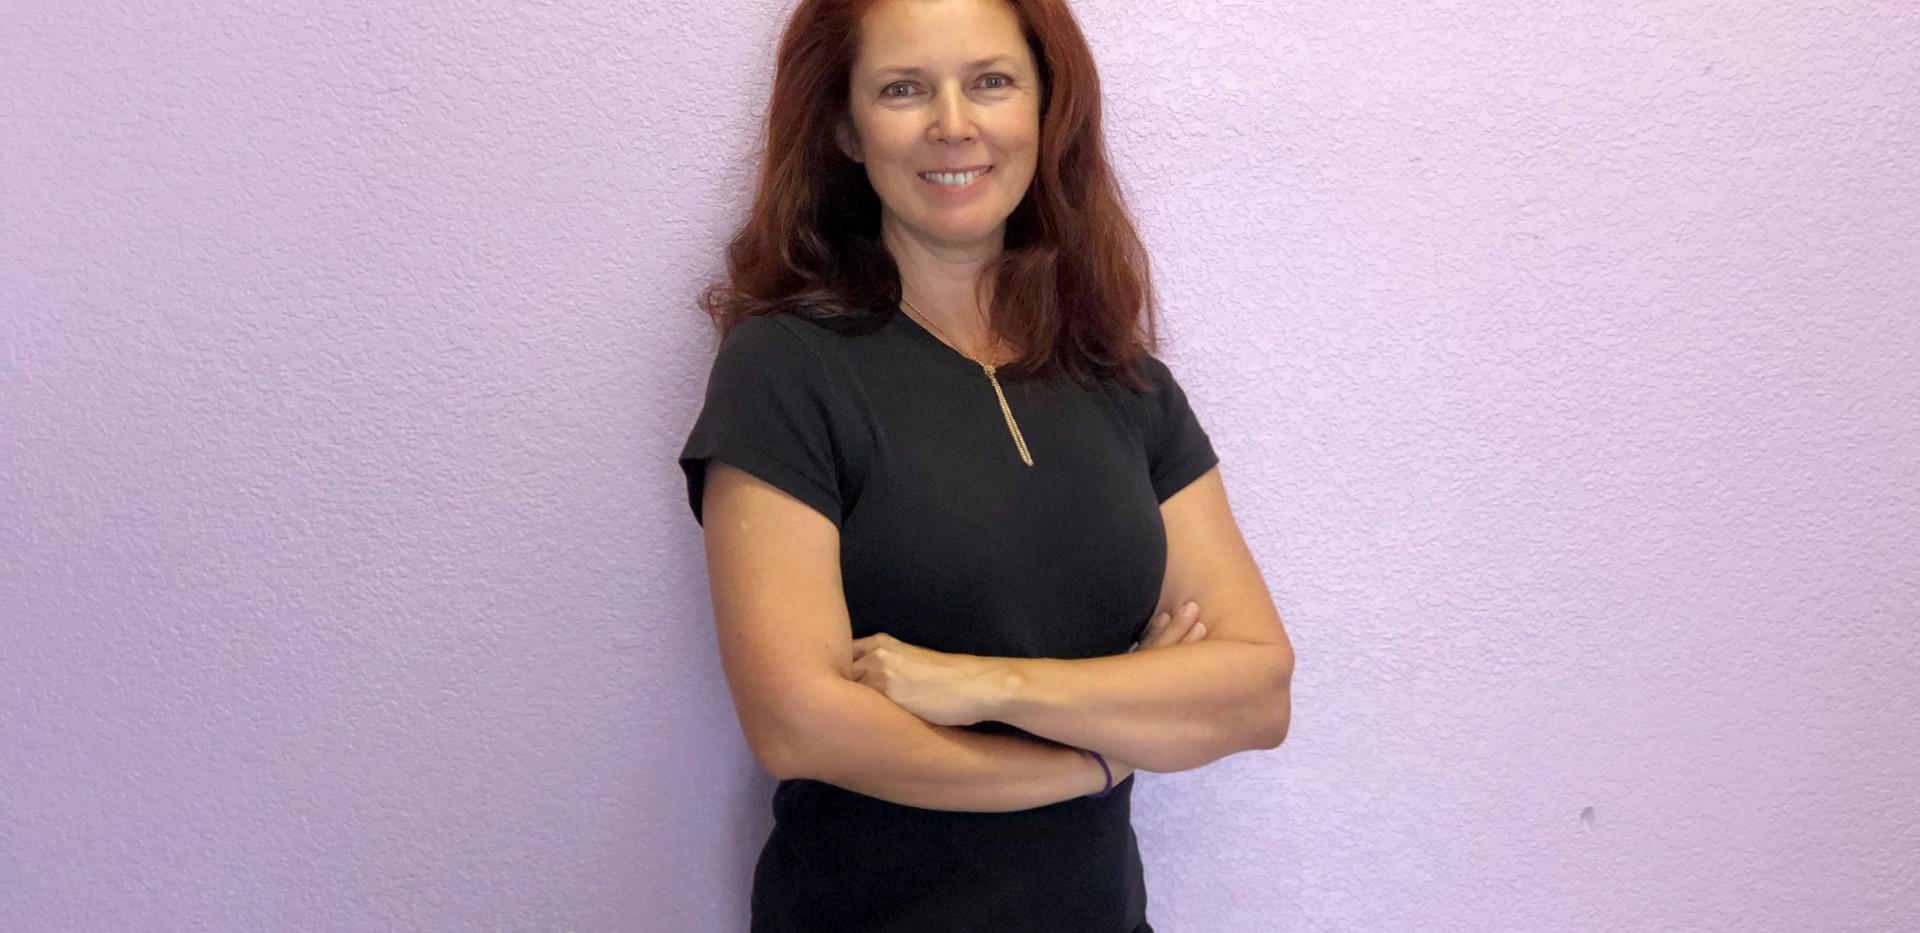 Ms. Angela Kastrilevich.jpg